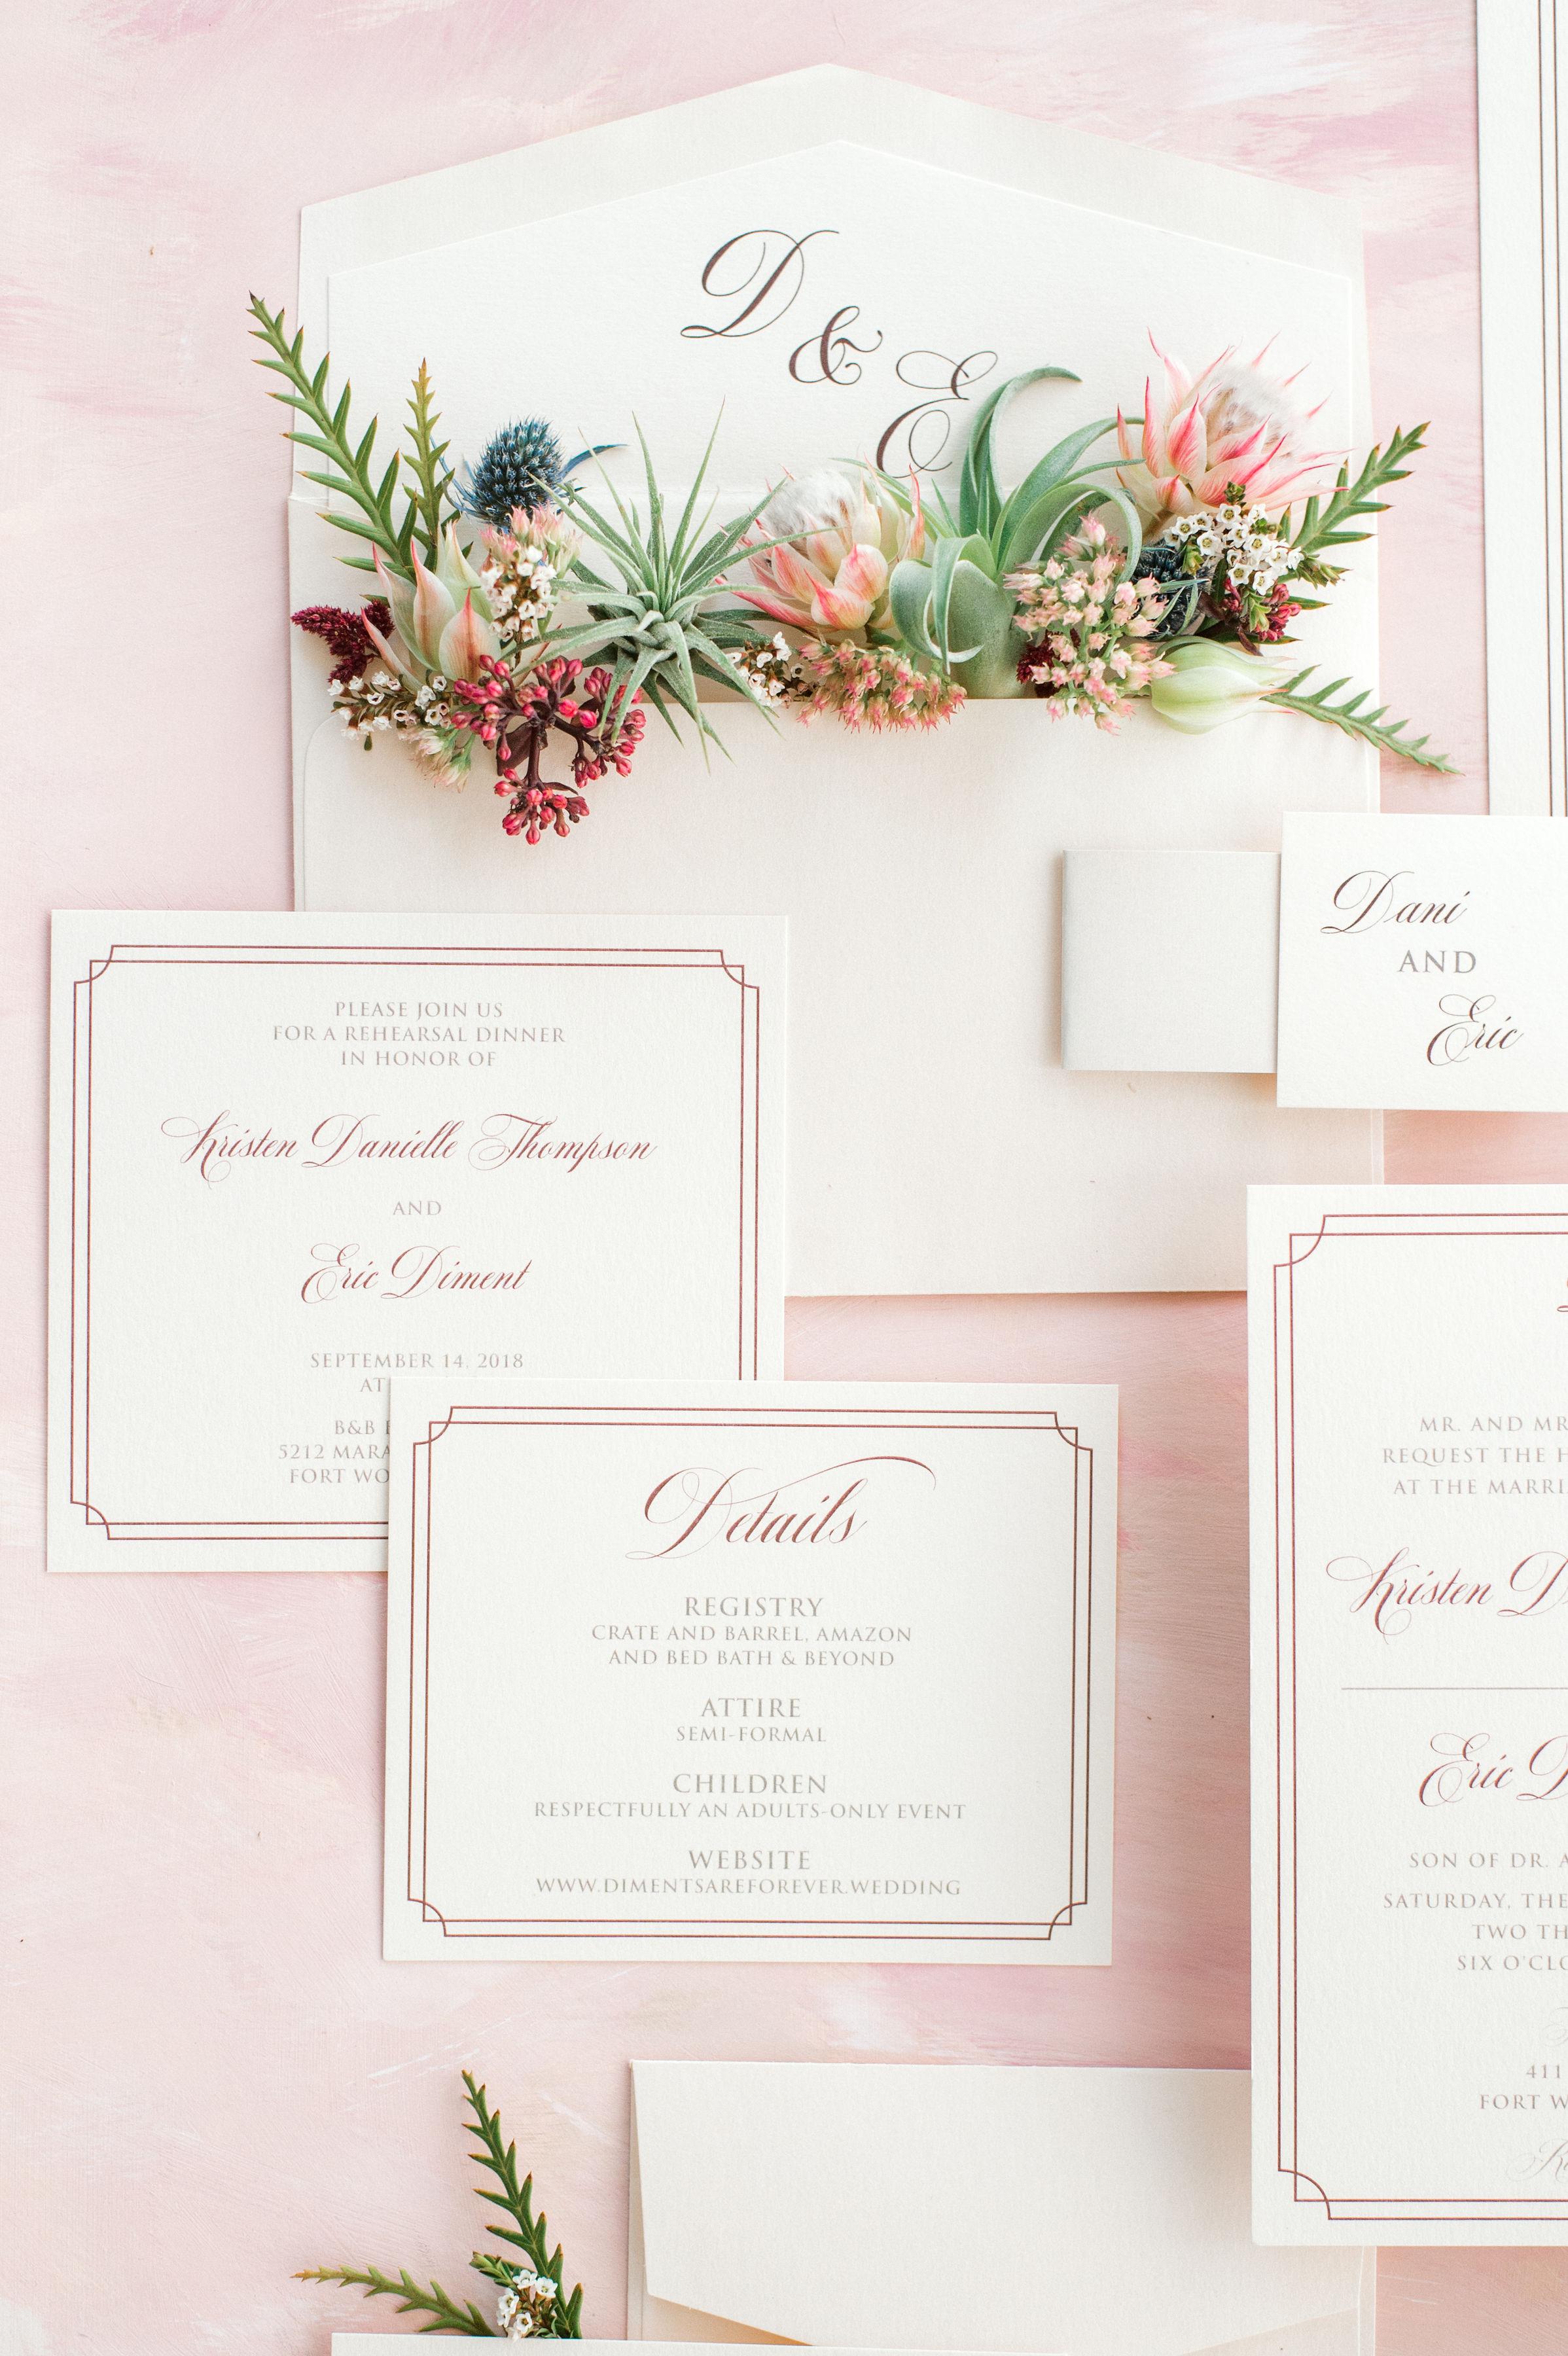 Formal Custom Wedding Invitations | Fall Eclectic Industrial Wedding Style